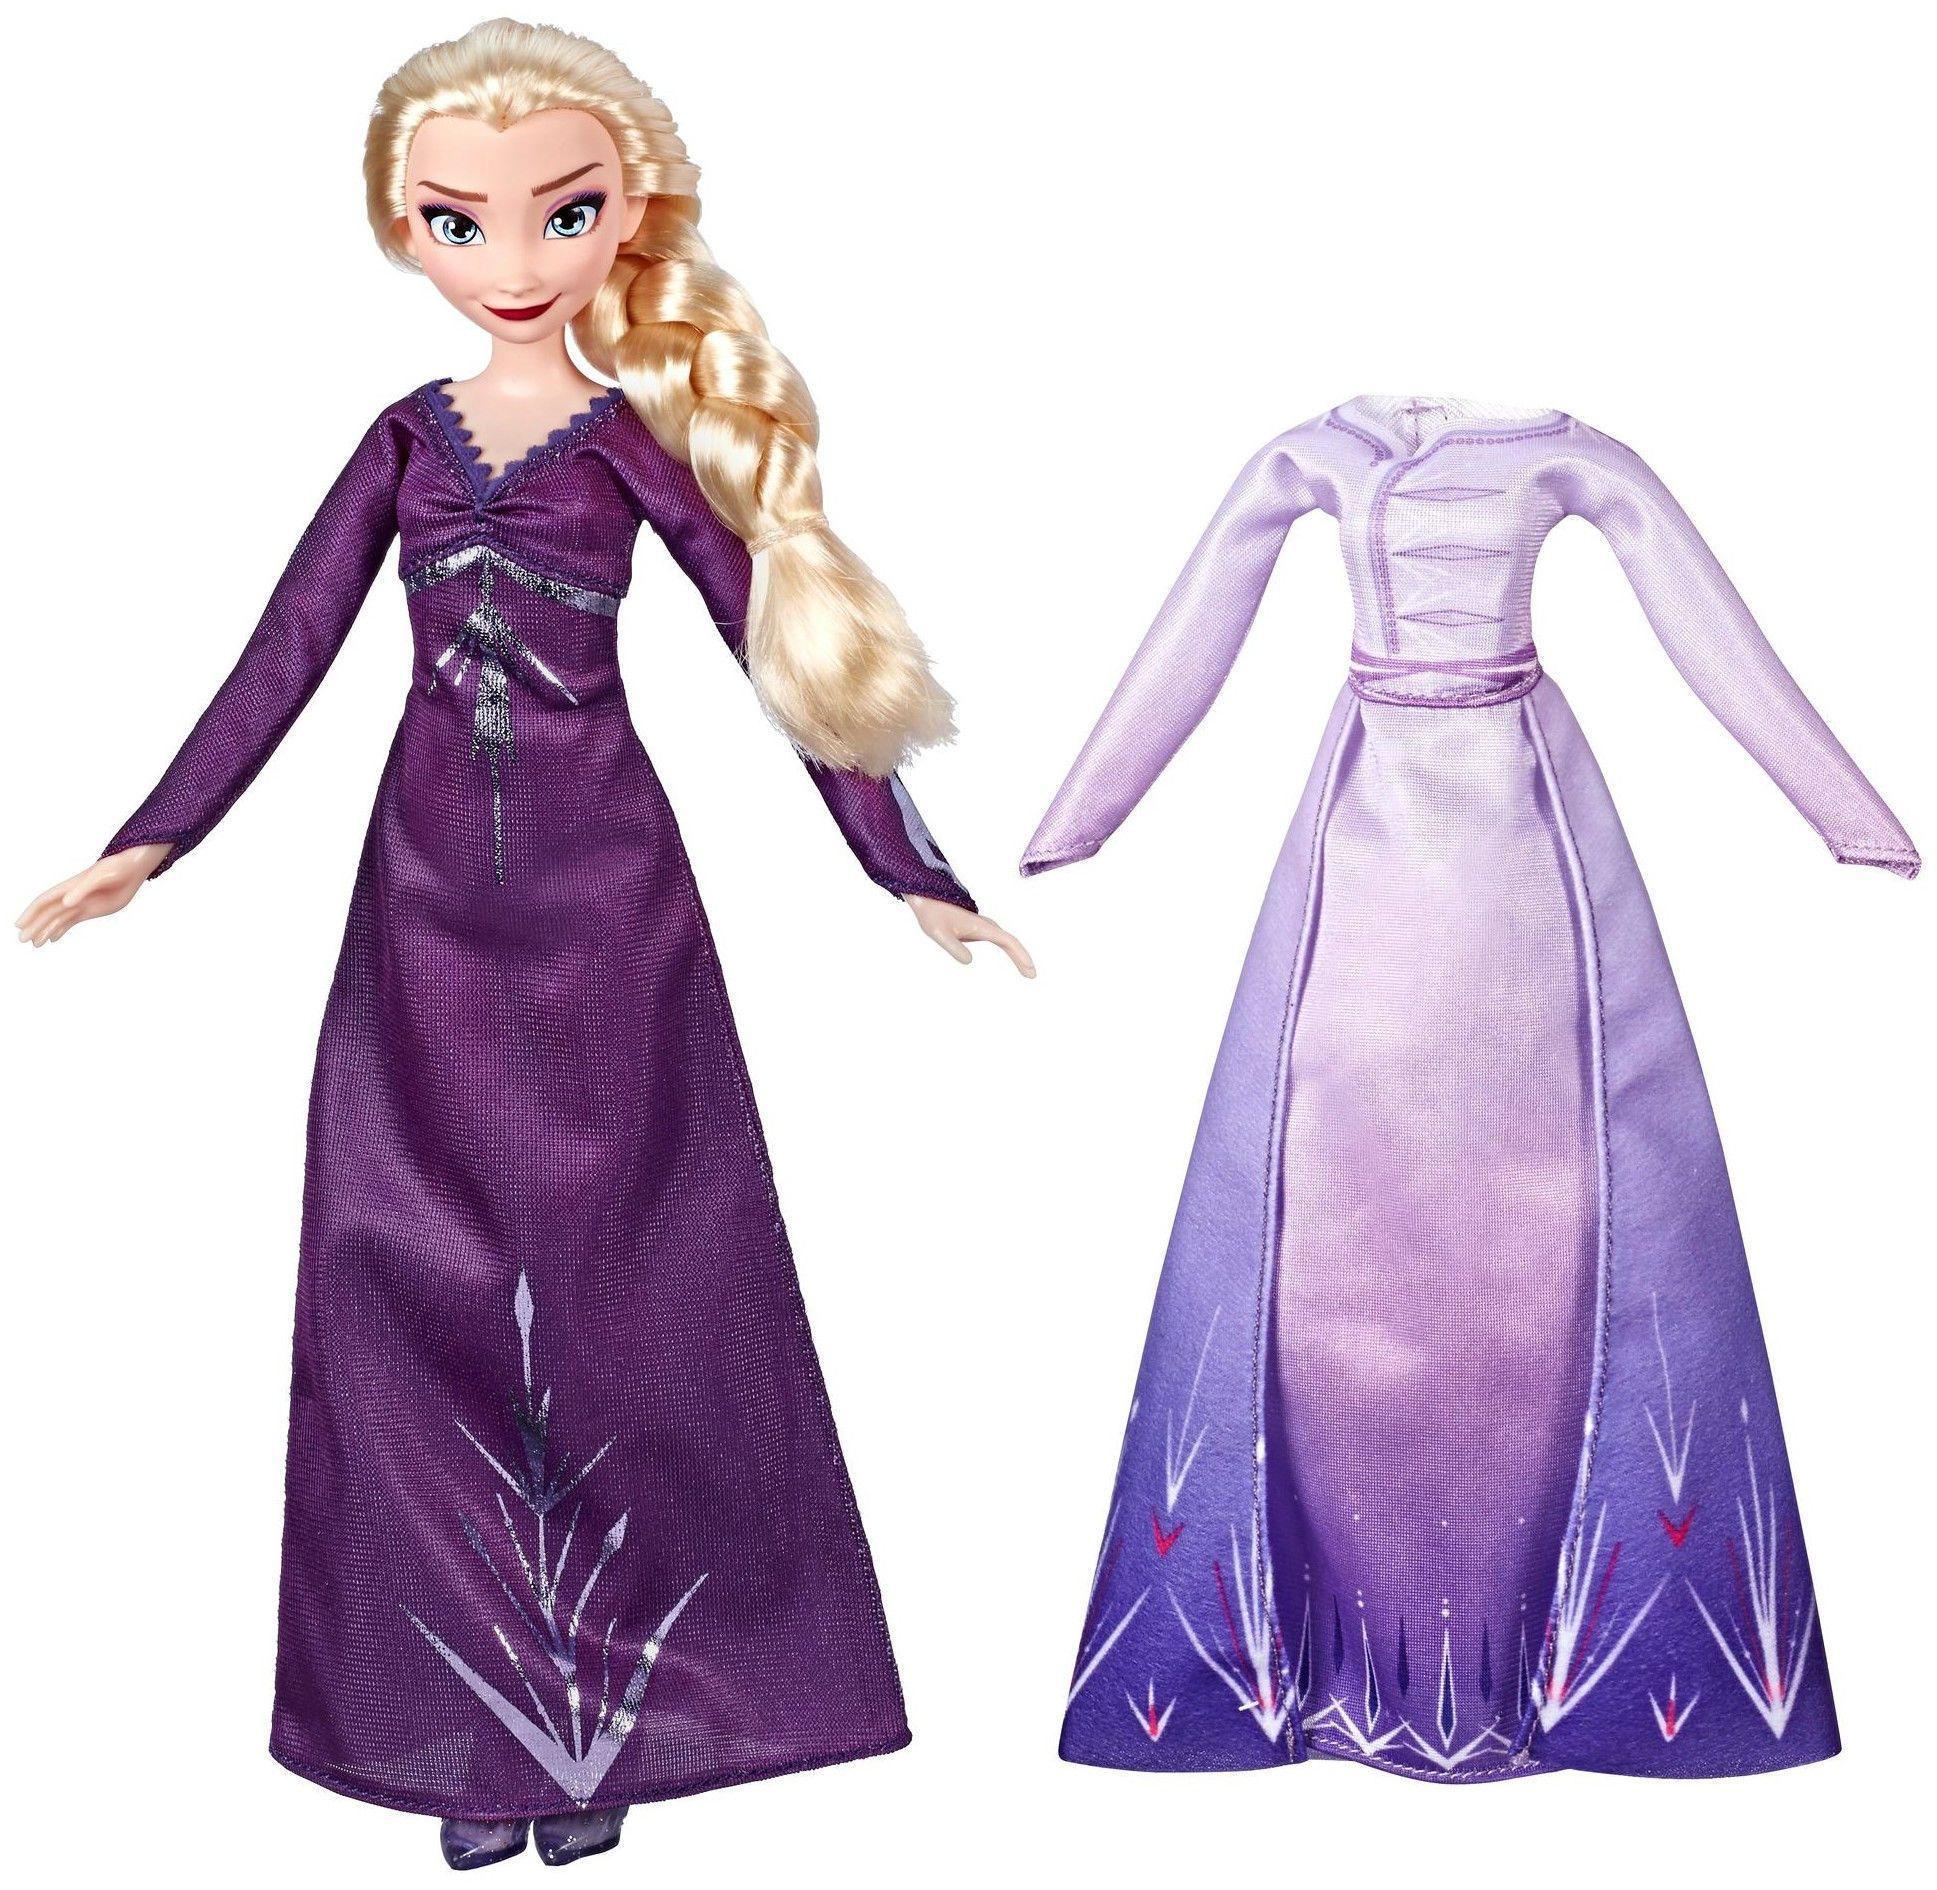 intra online informatii pentru mai multe fotografii Papusa Hasbro Frozen 2 - Elsa din Arendelle, cu 2 rochii | Ozone.ro